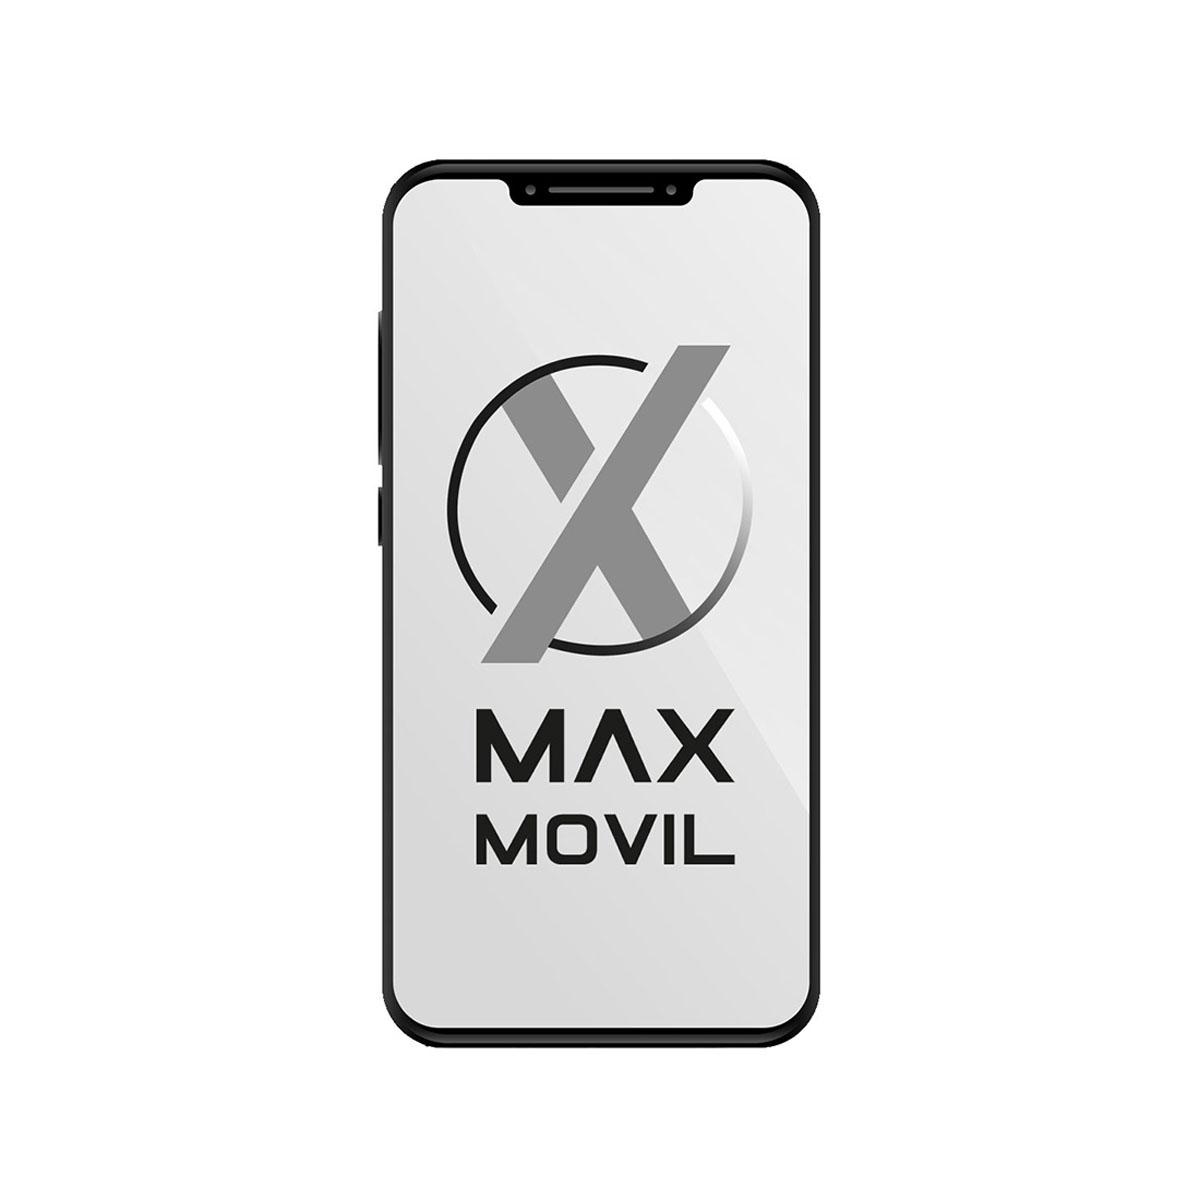 Cargador inalámbrico para iPhone 8 y iPhone X Minibatt M1